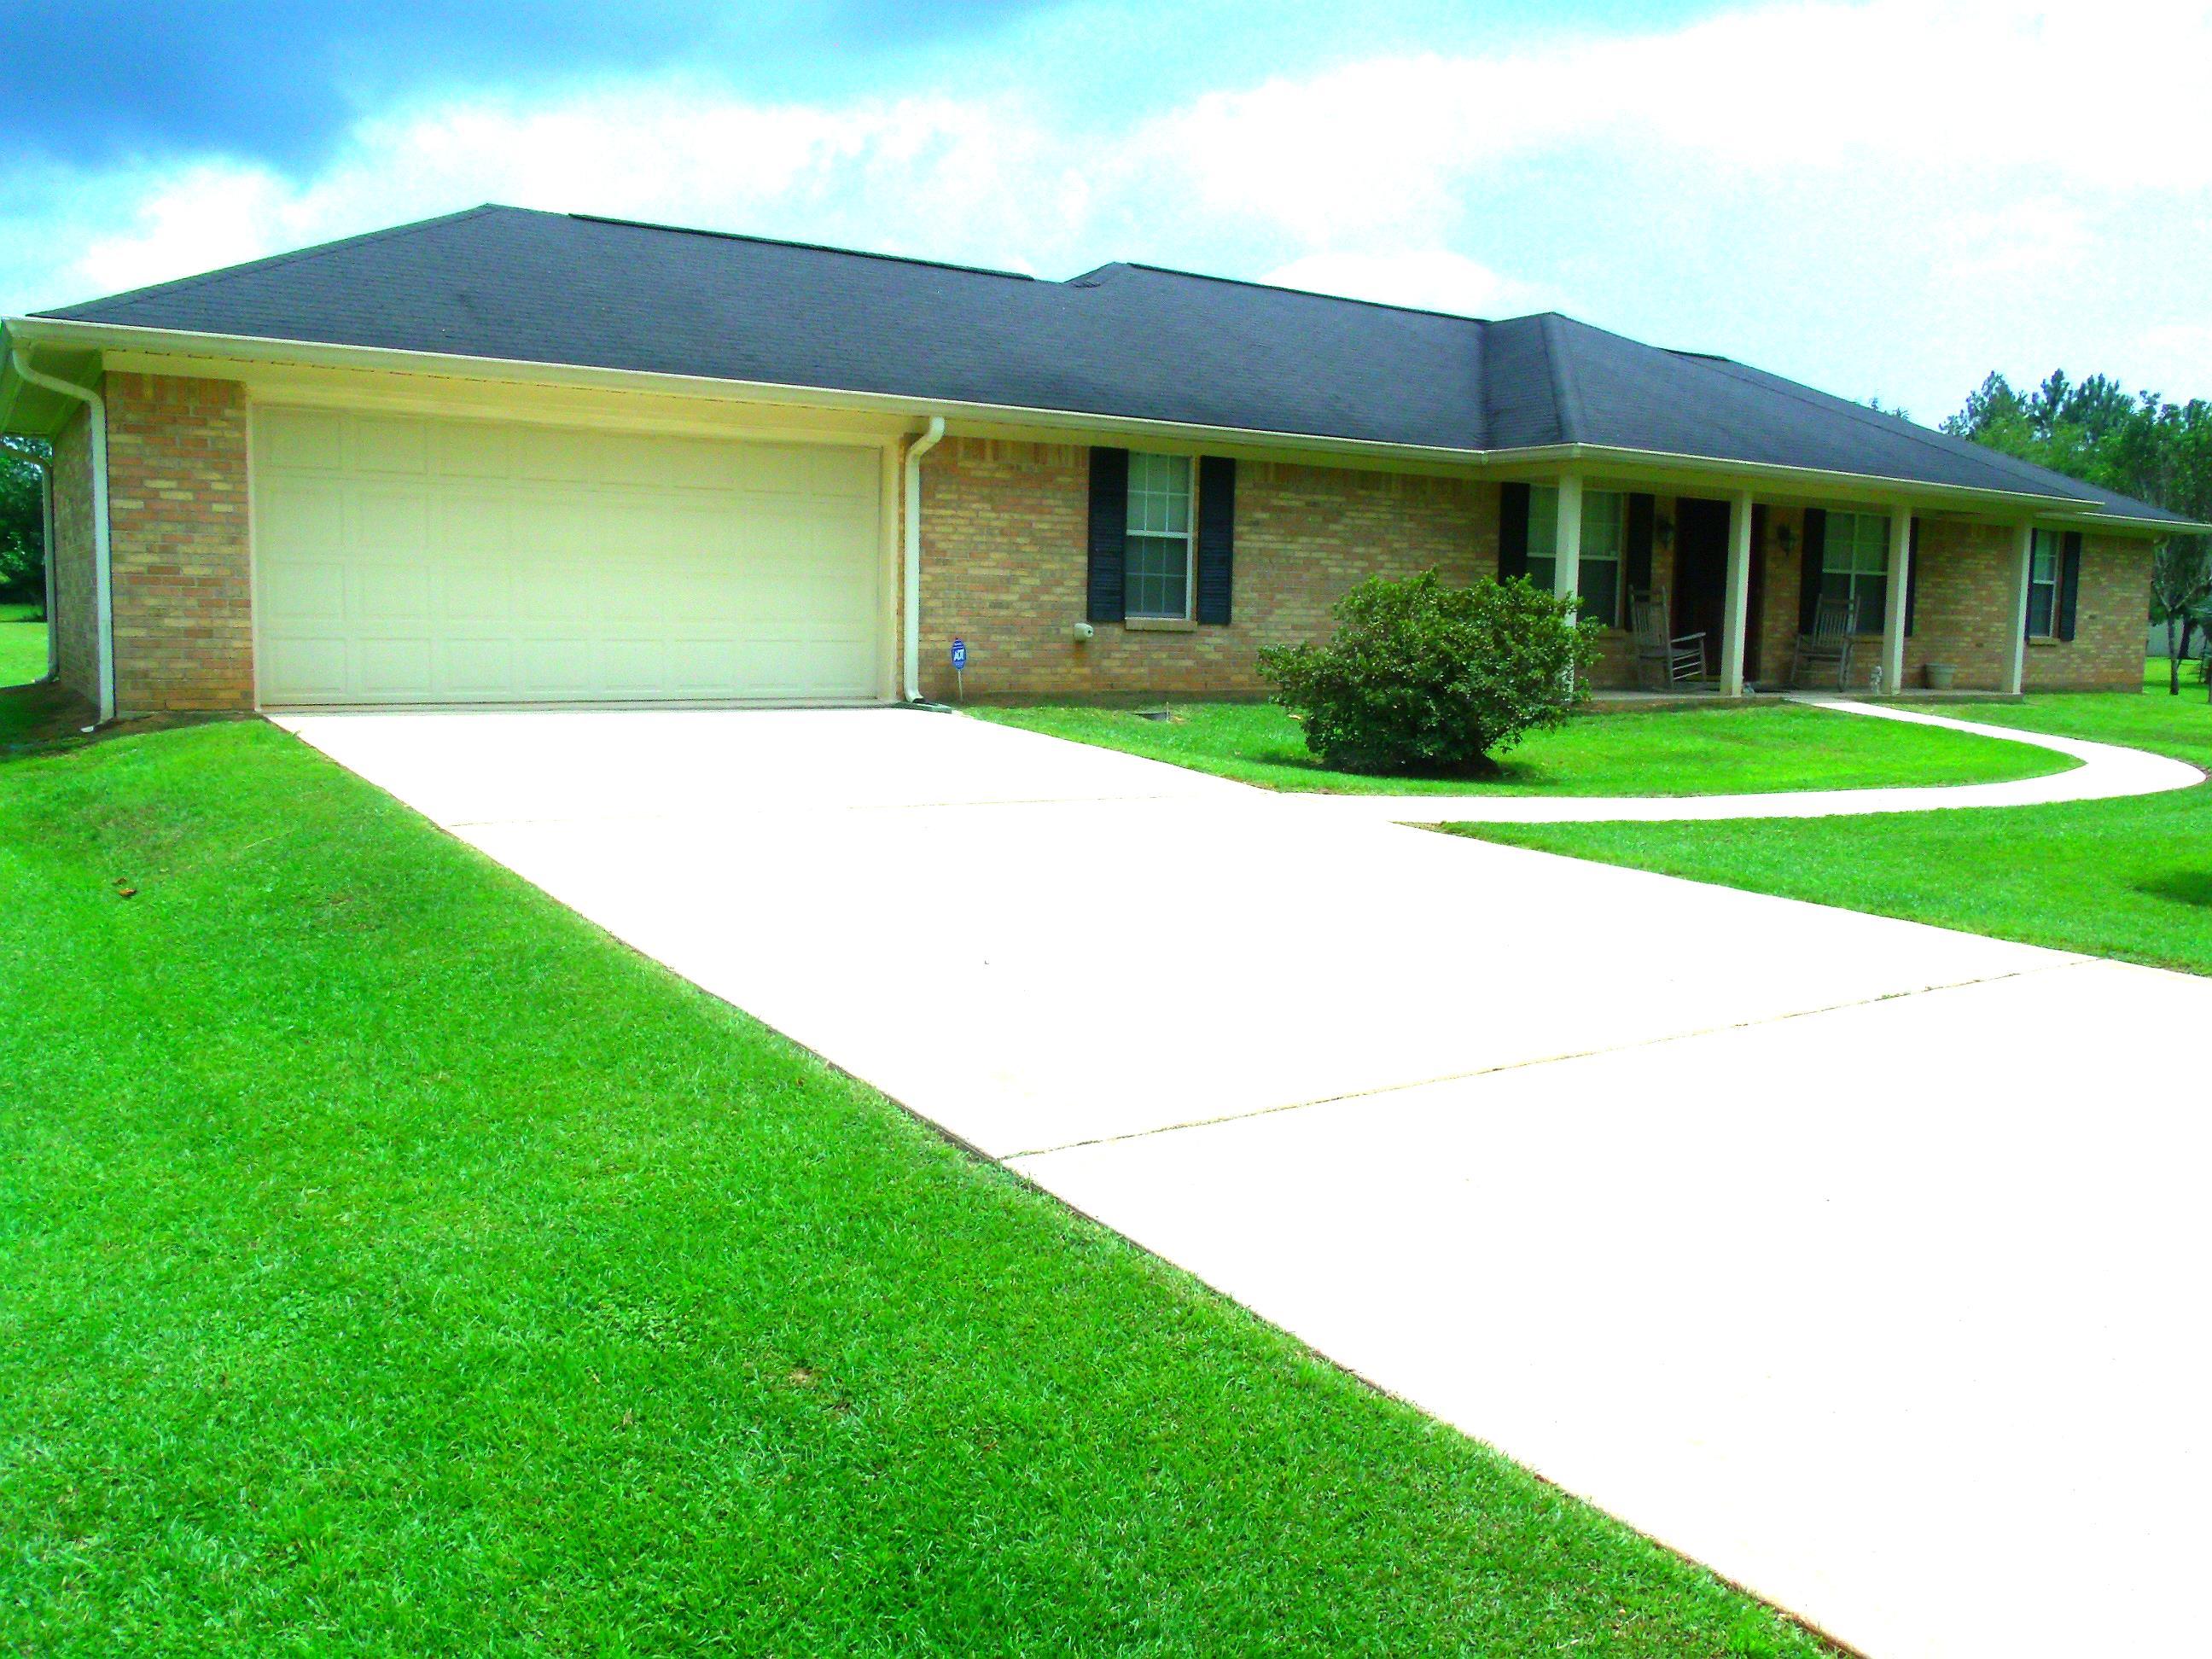 Alabama baldwin county stockton - Serenity At Its Best 4 2 Home With 6 Acres In Elberta Alabama Baldwin